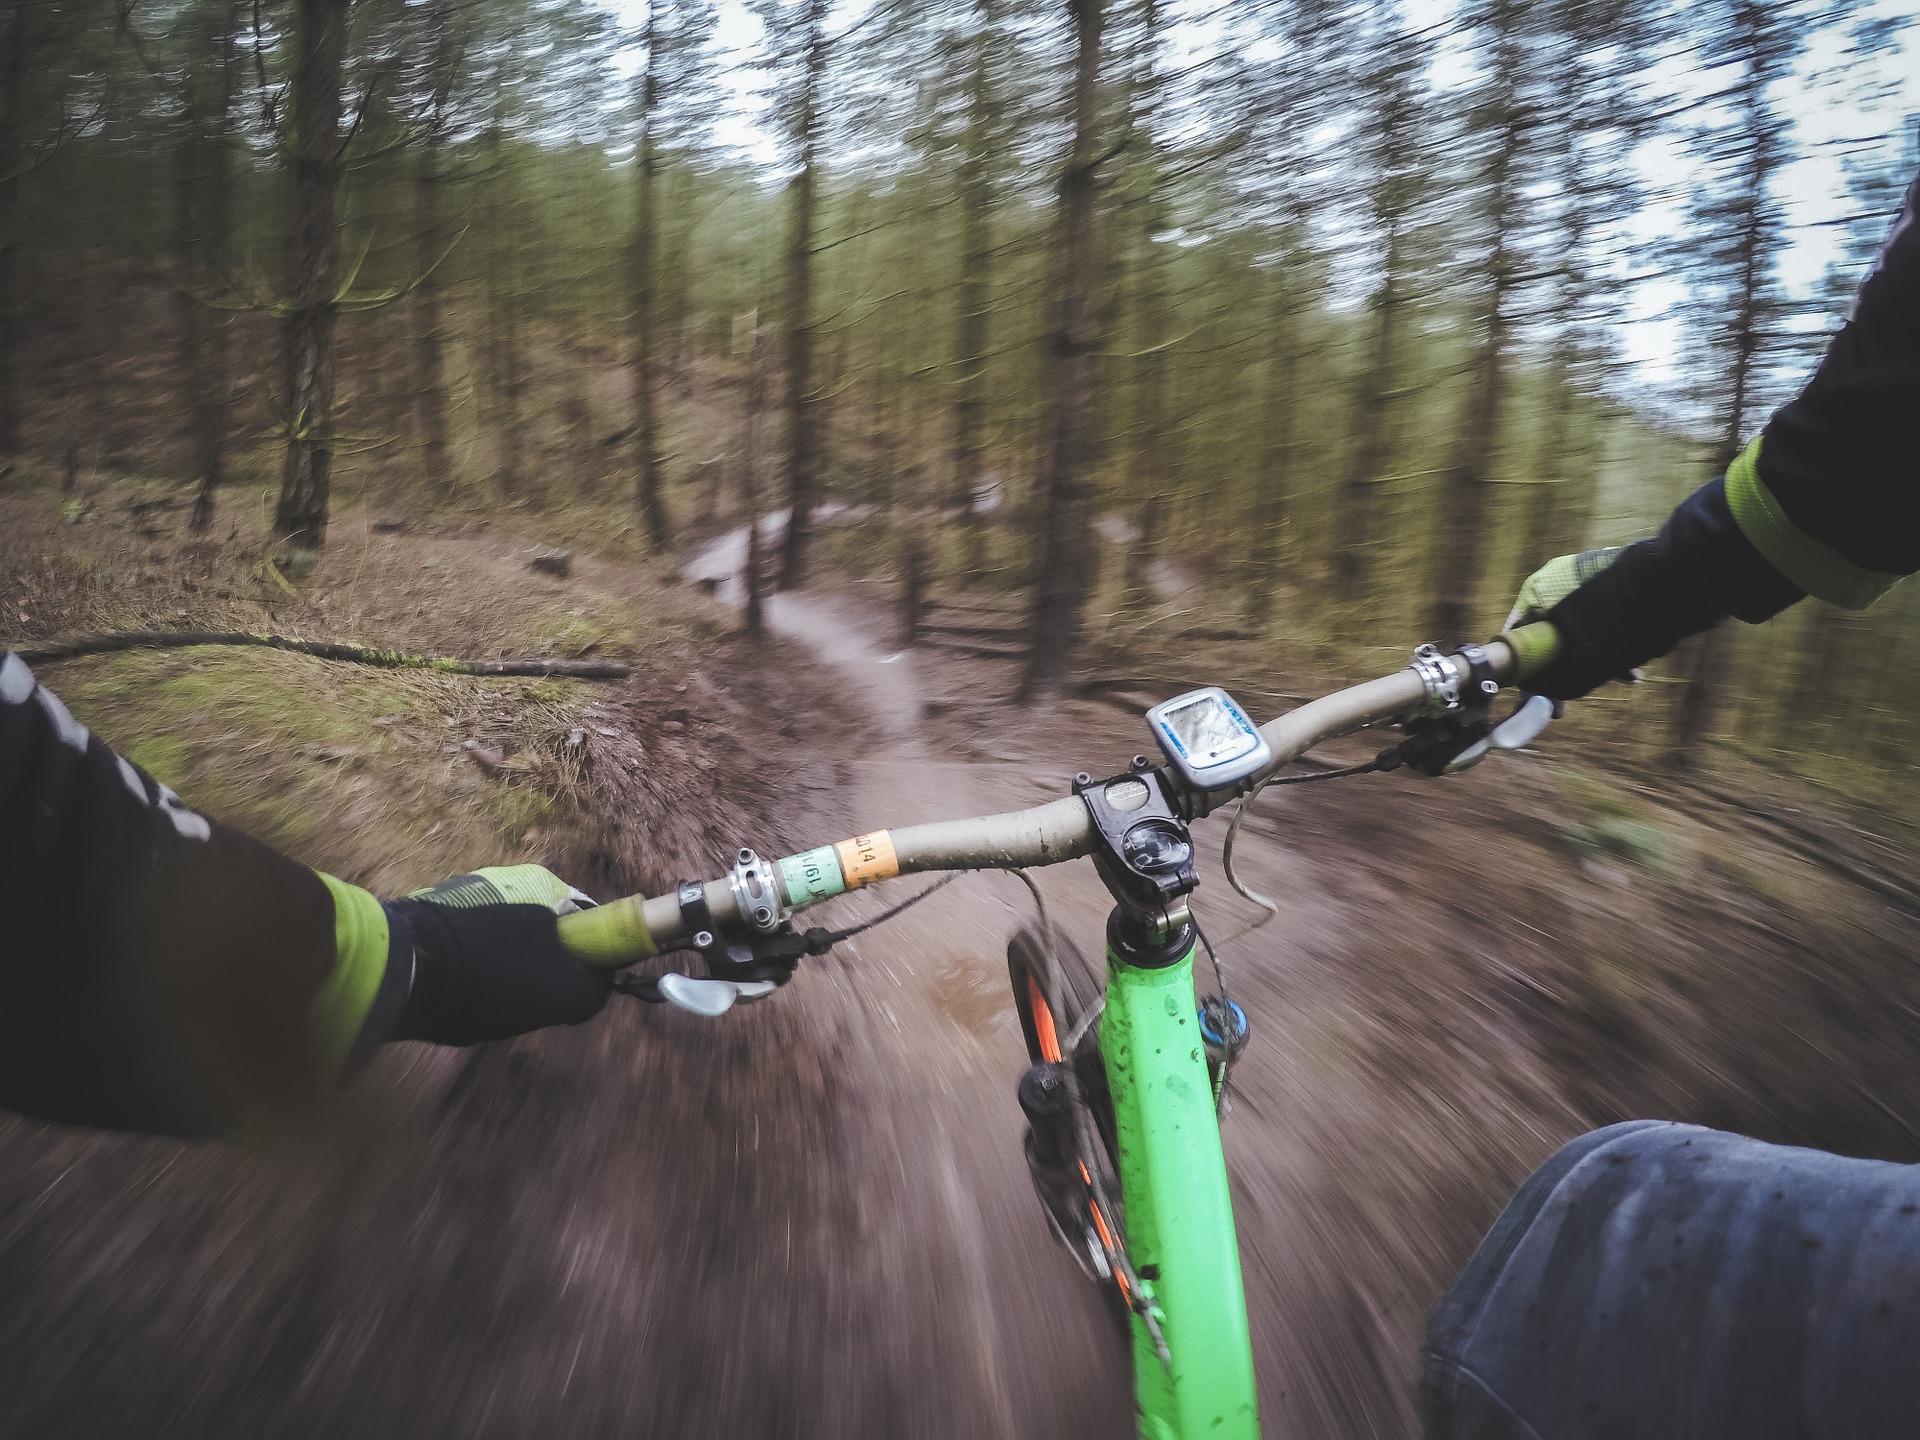 Radfahren, Fahrrad, Berg, Risiko, Ende - Wallpaper HD - Prof.-falken.com